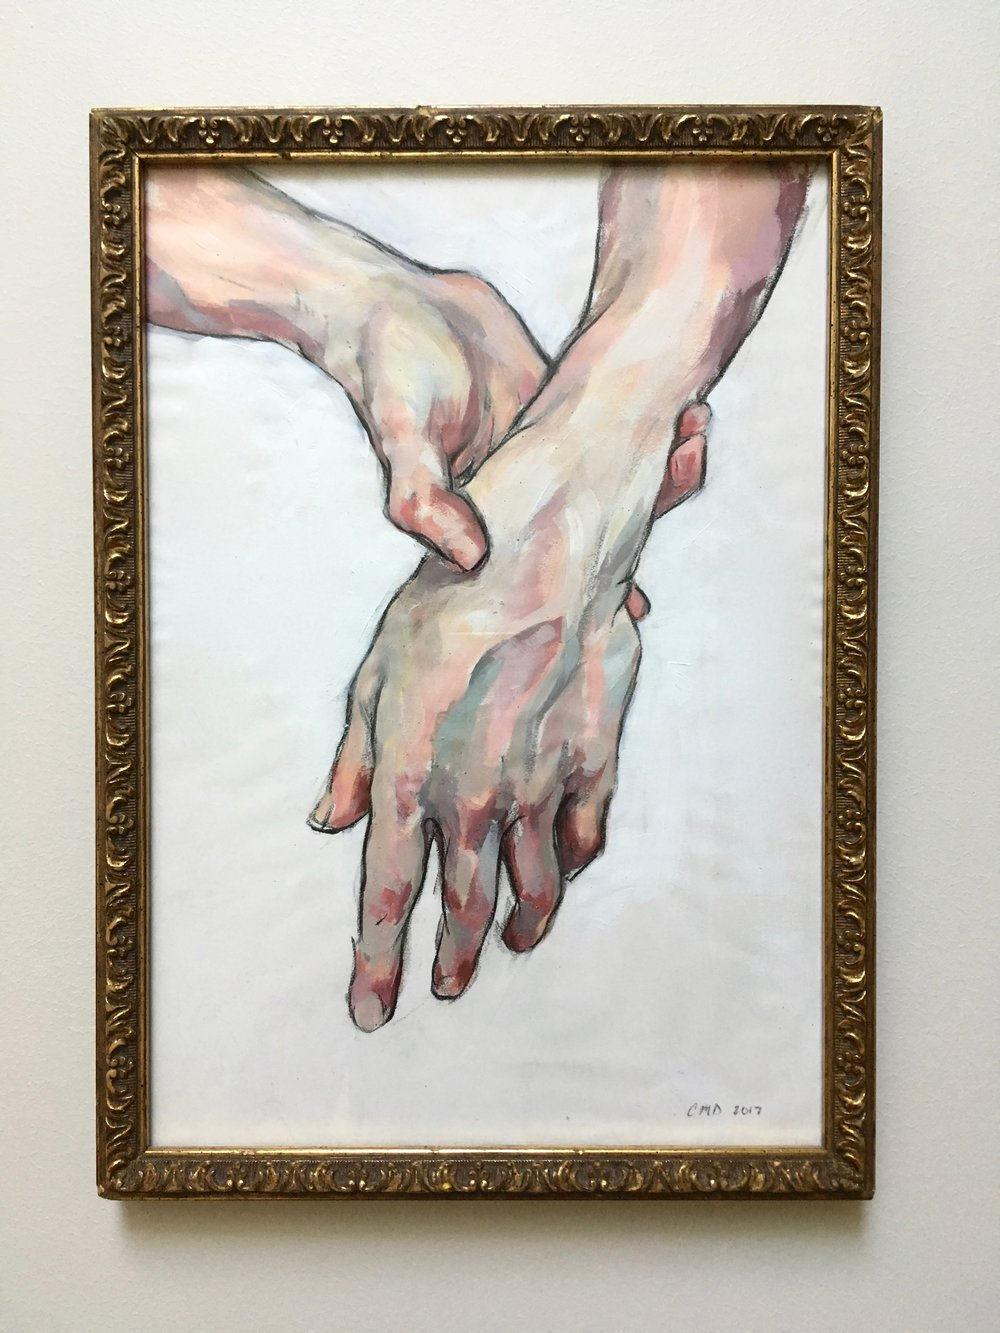 "Slack Wrist, Acrylic on Paper, 14x10'"", 2017"